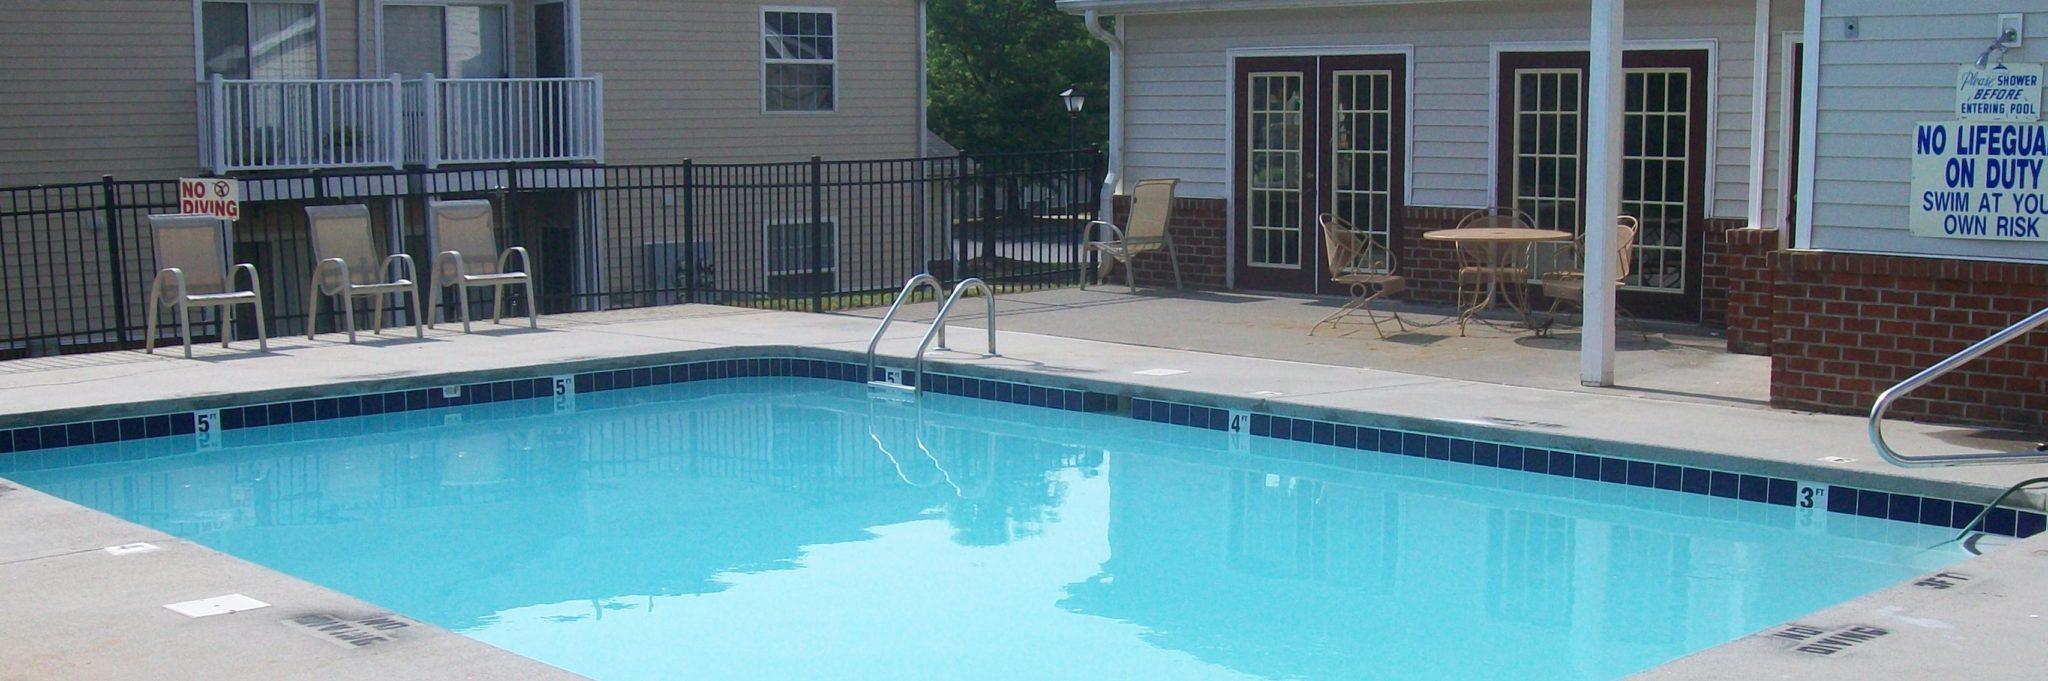 Griffith Commons Winston Salem North Carolina swimming pool .3